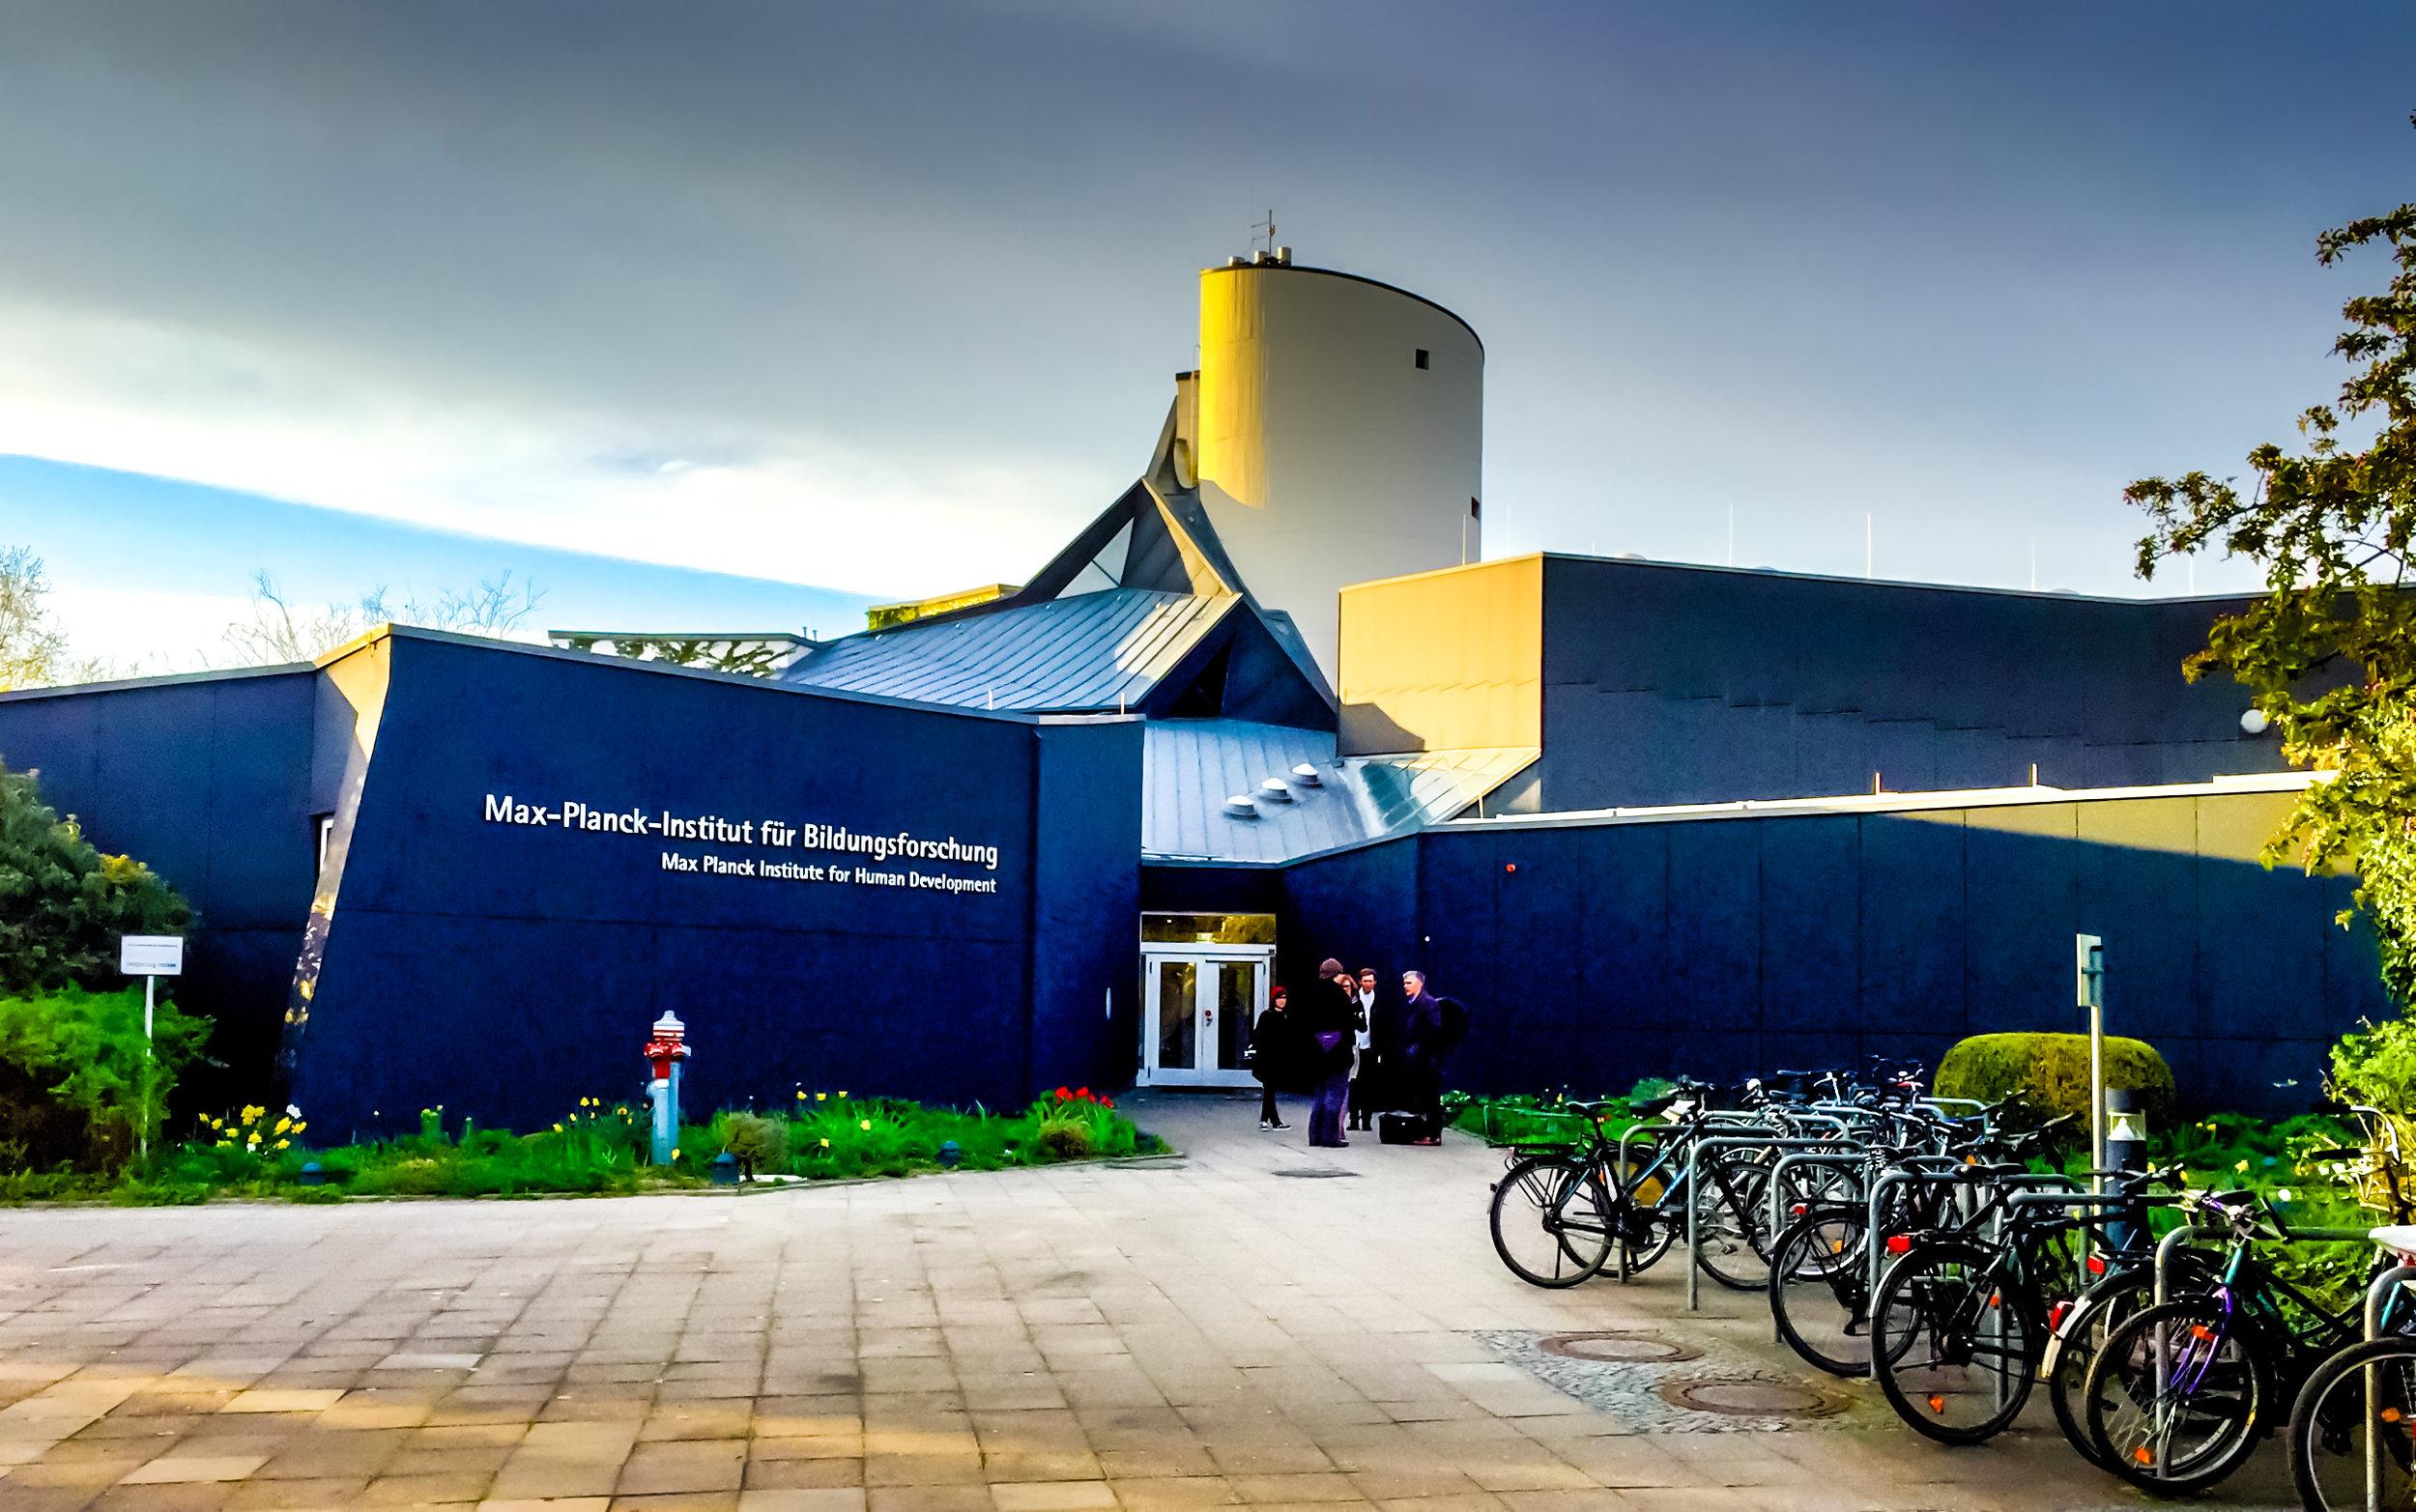 Max Planck Institute for Human Development